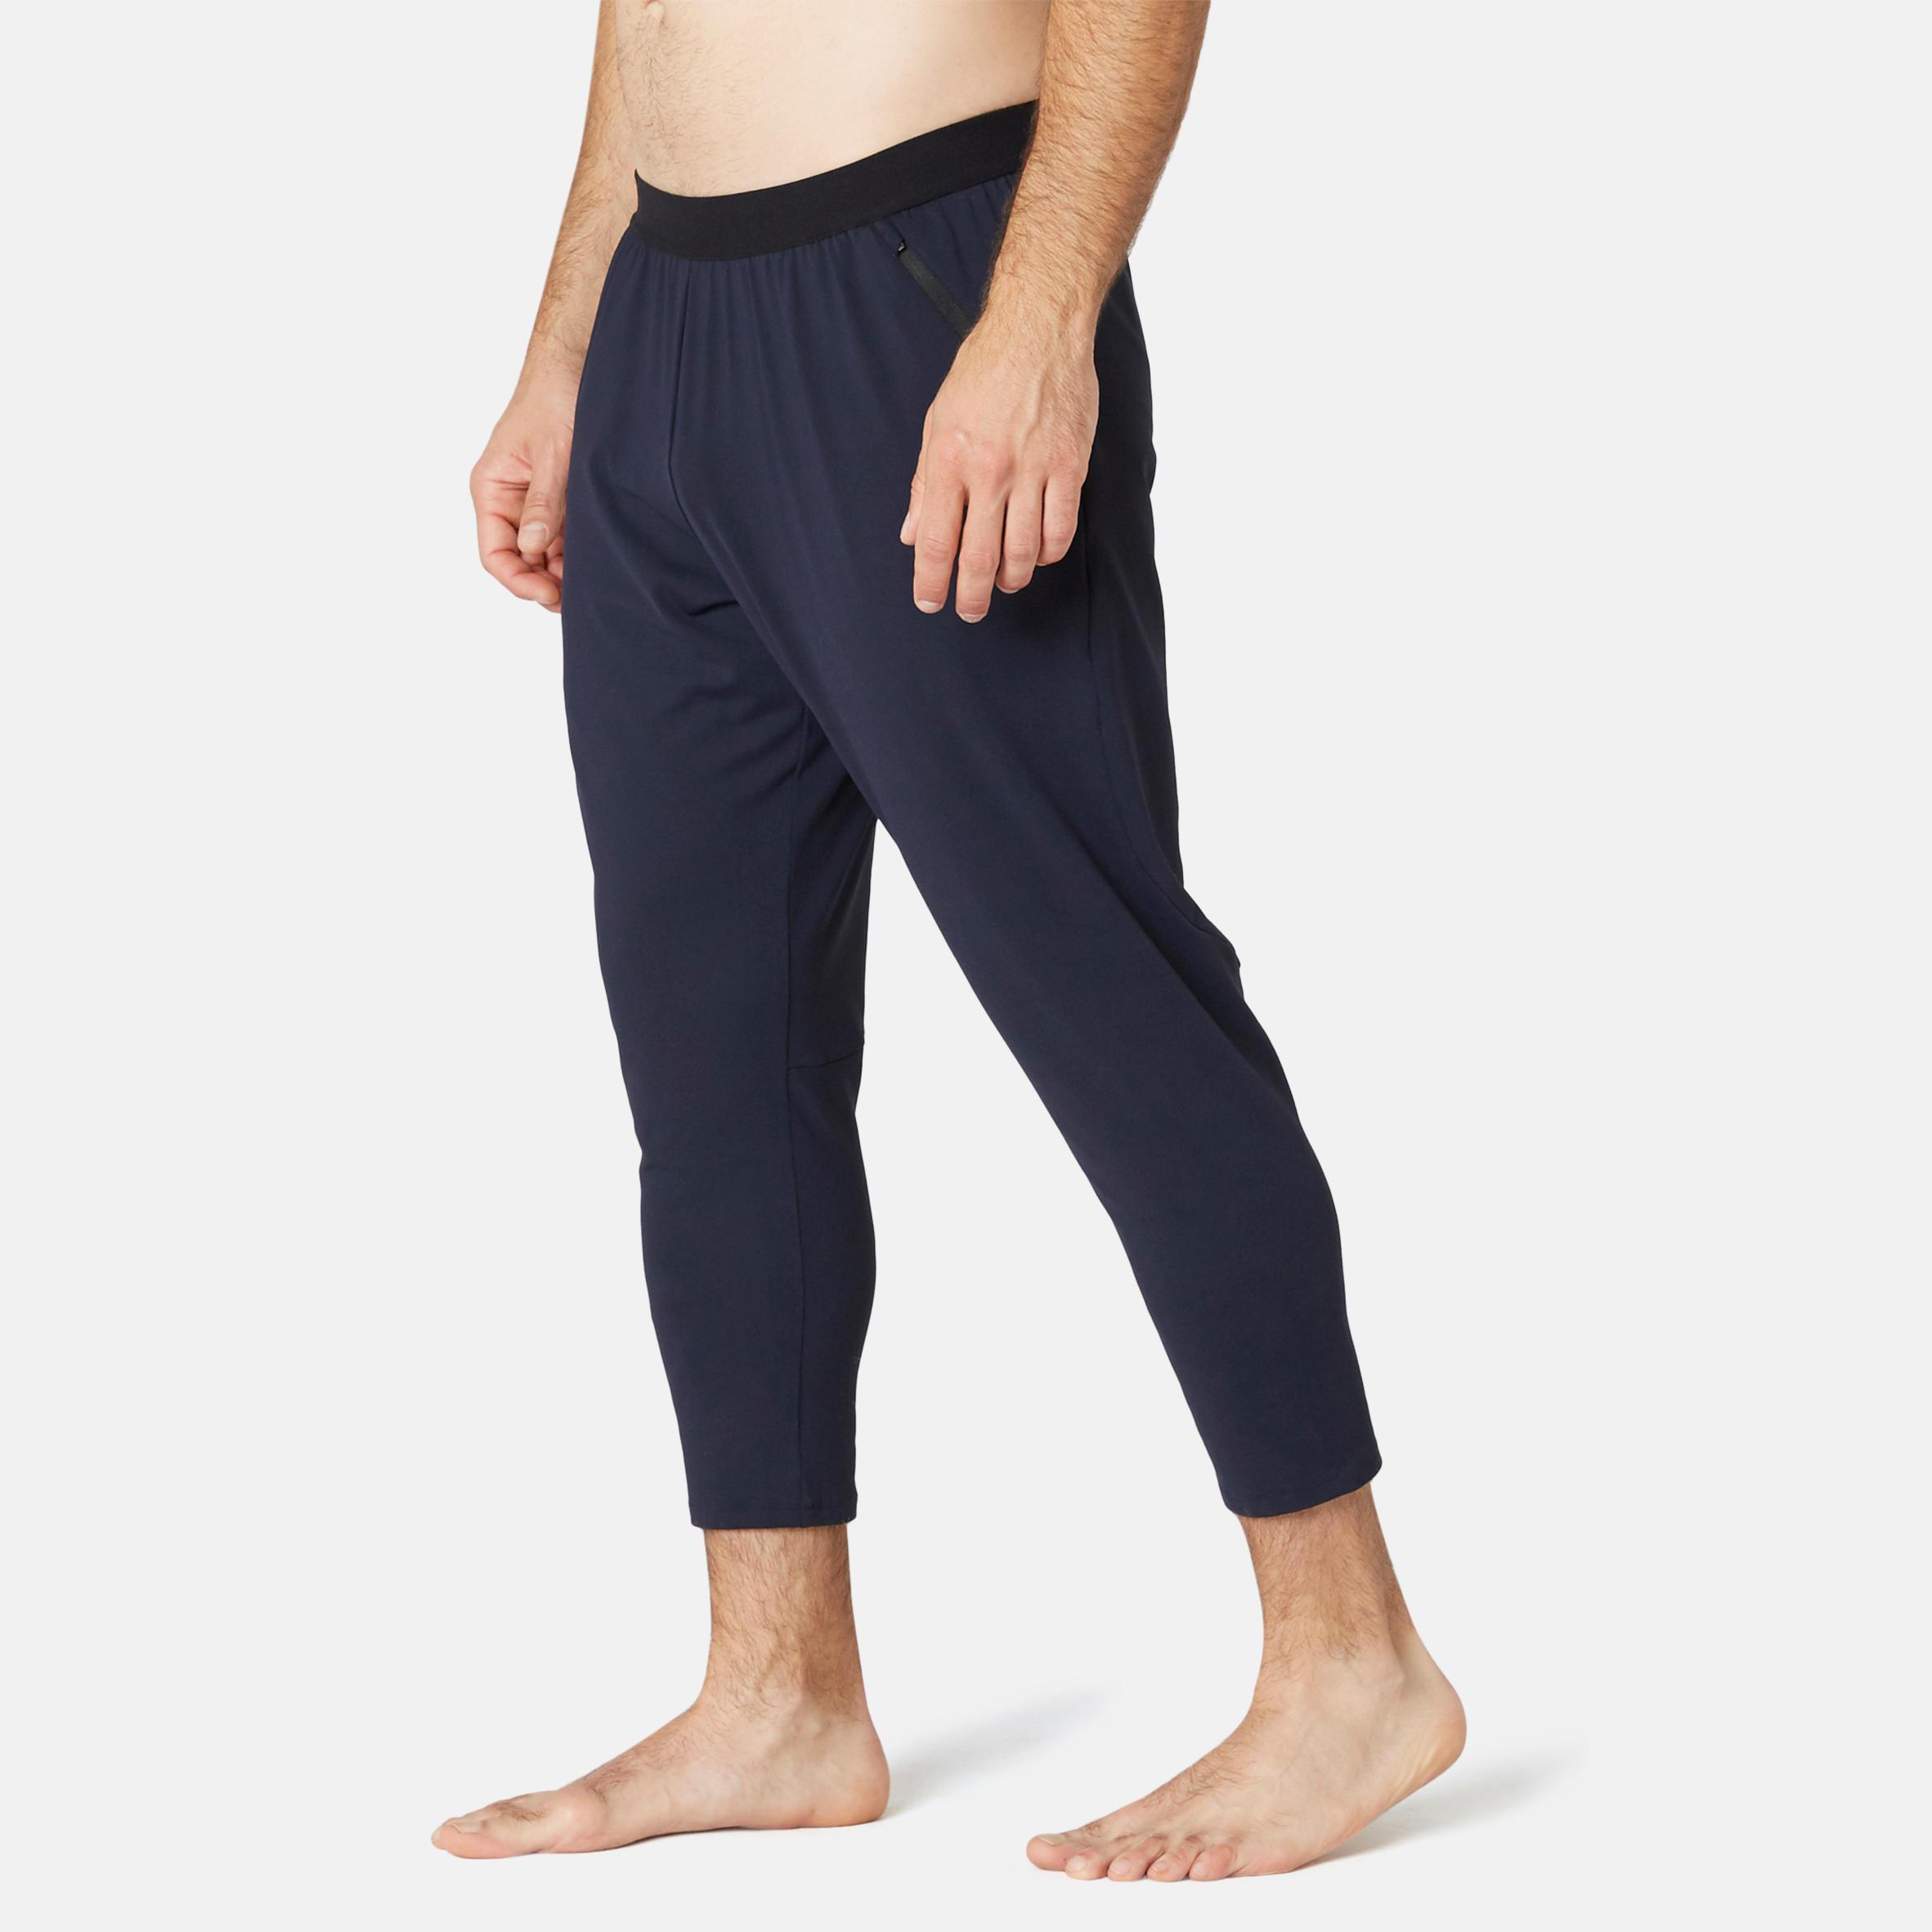 Pantalon slim 560 7/8 Bărbați imagine